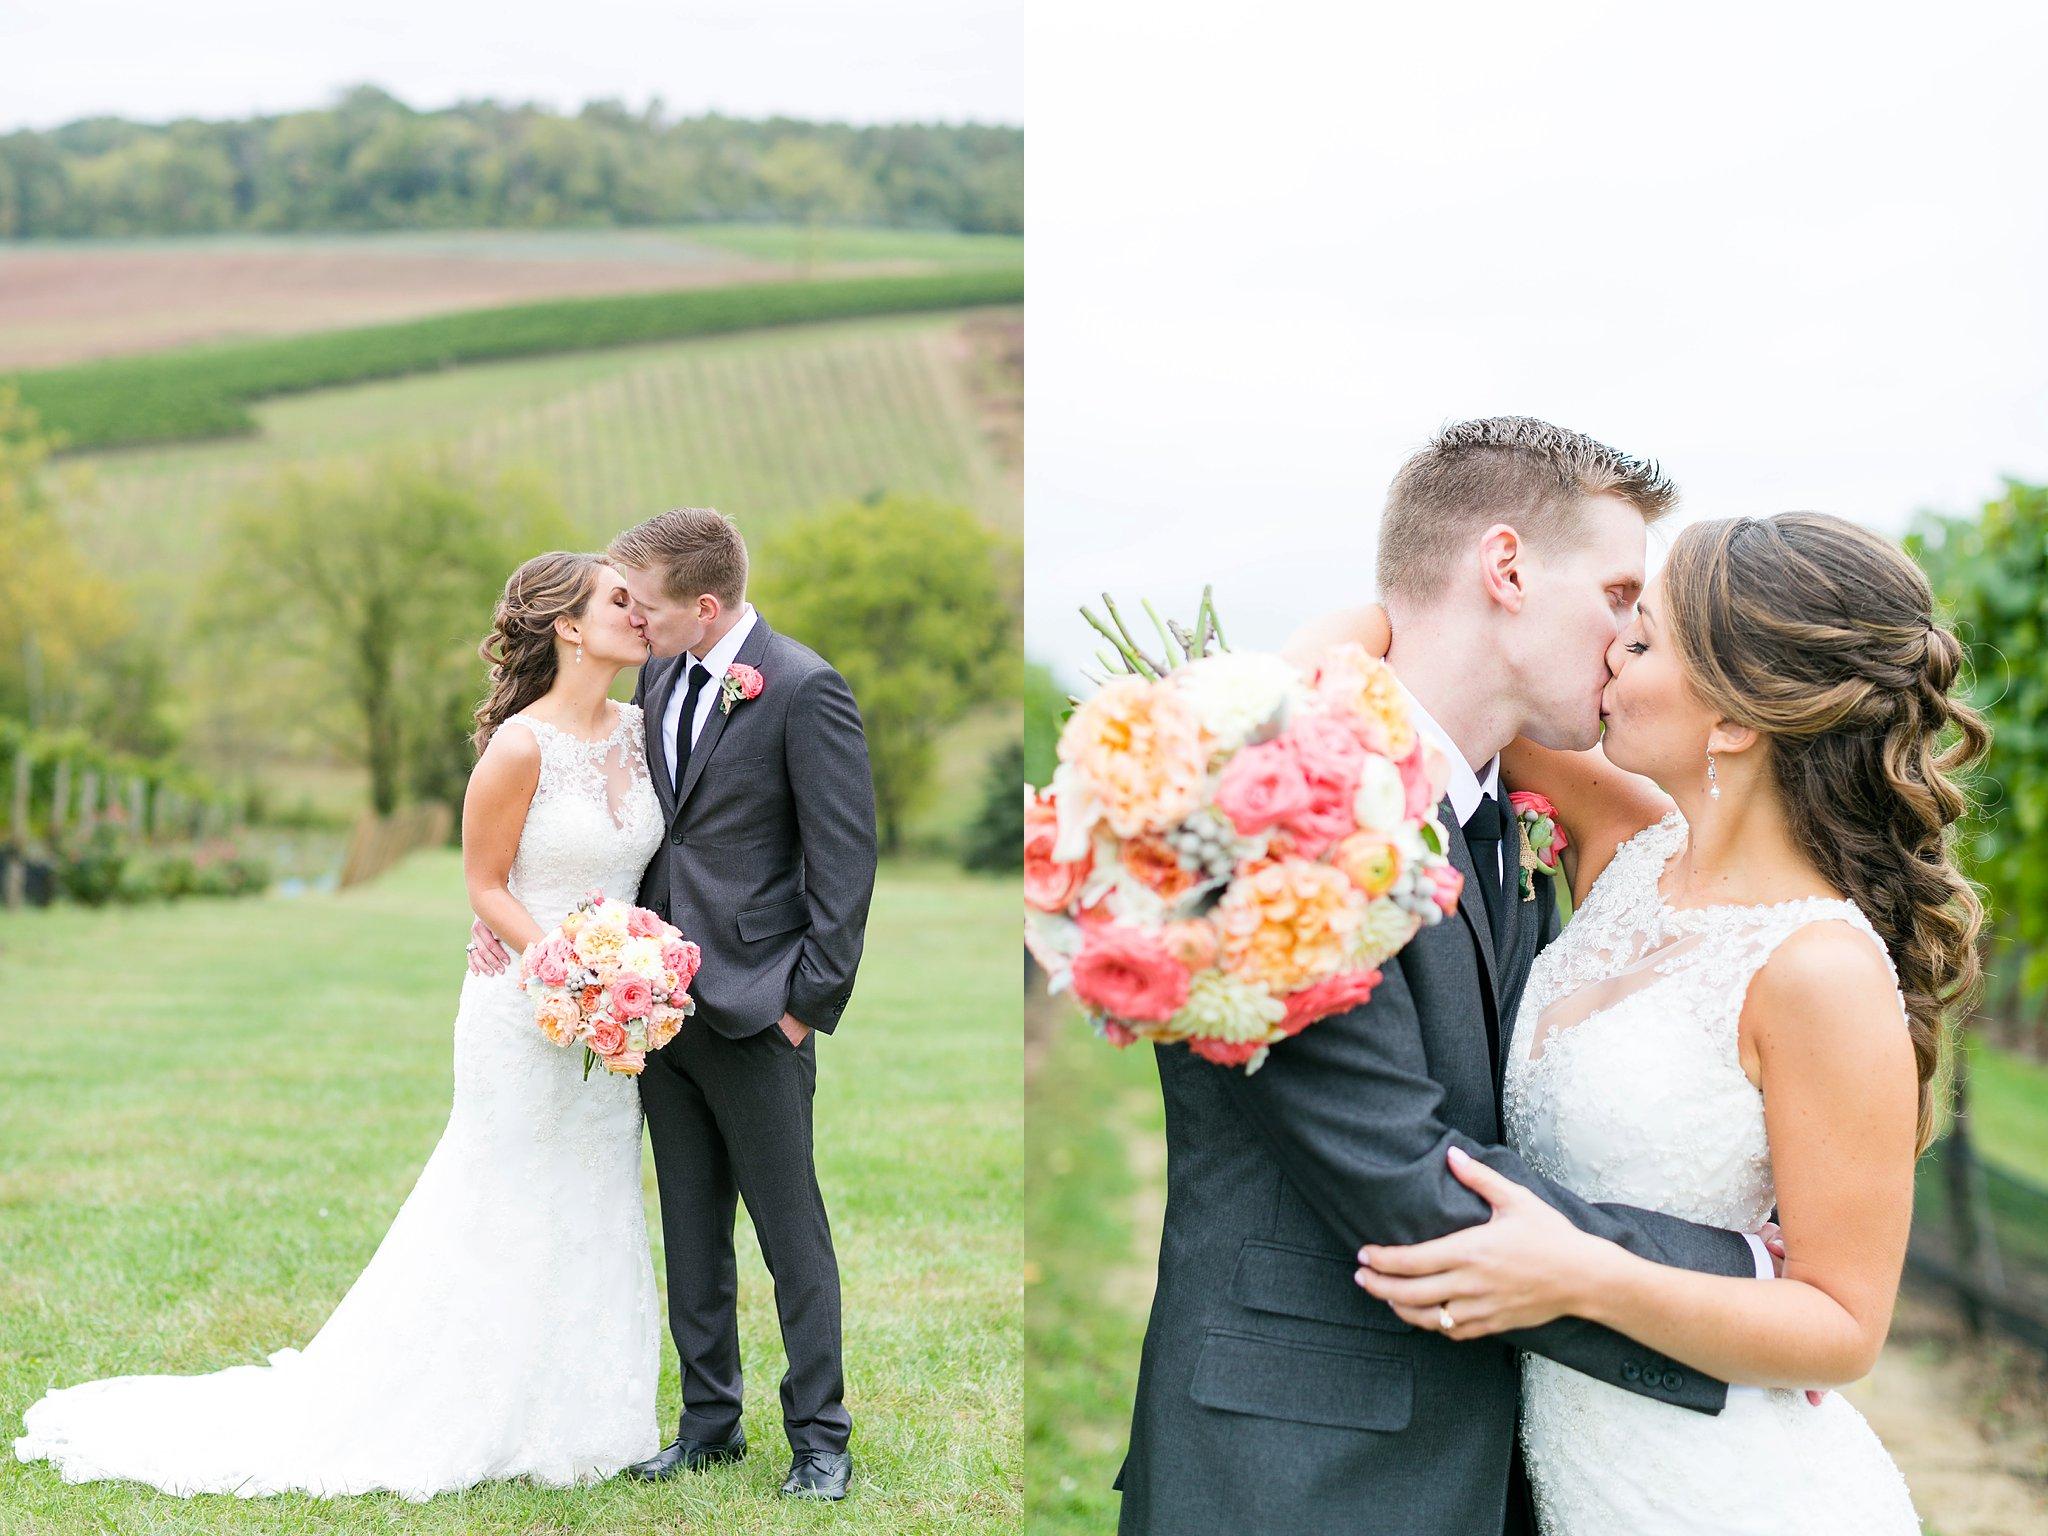 Stone Tower Winery Wedding Photos Virginia Wedding Photographer Megan Kelsey Photography Sam & Angela-223.jpg